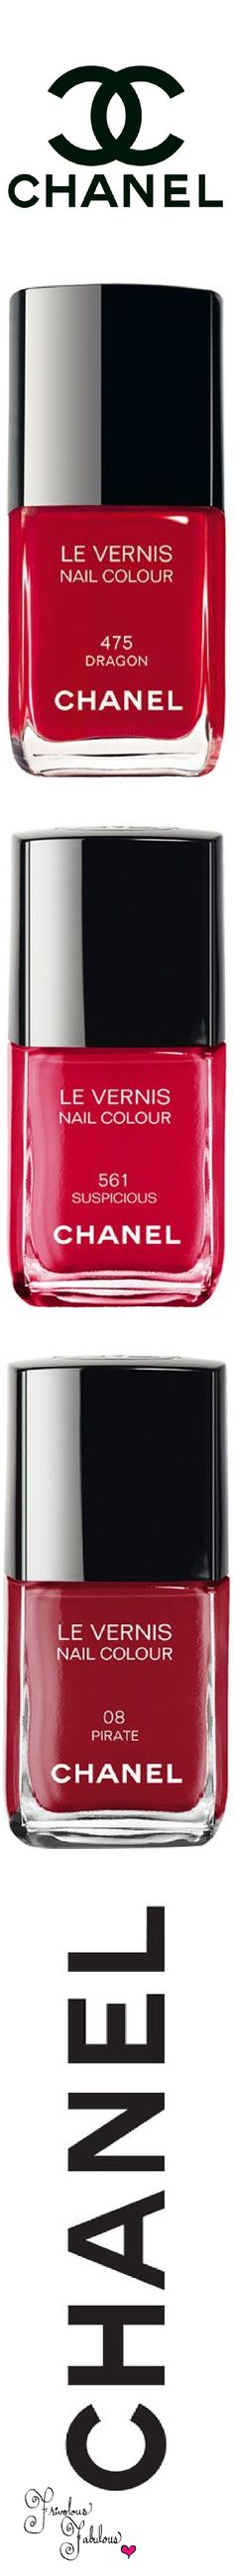 Frivolous Fabulous - Chanel for Miss Frivolous Fabulous